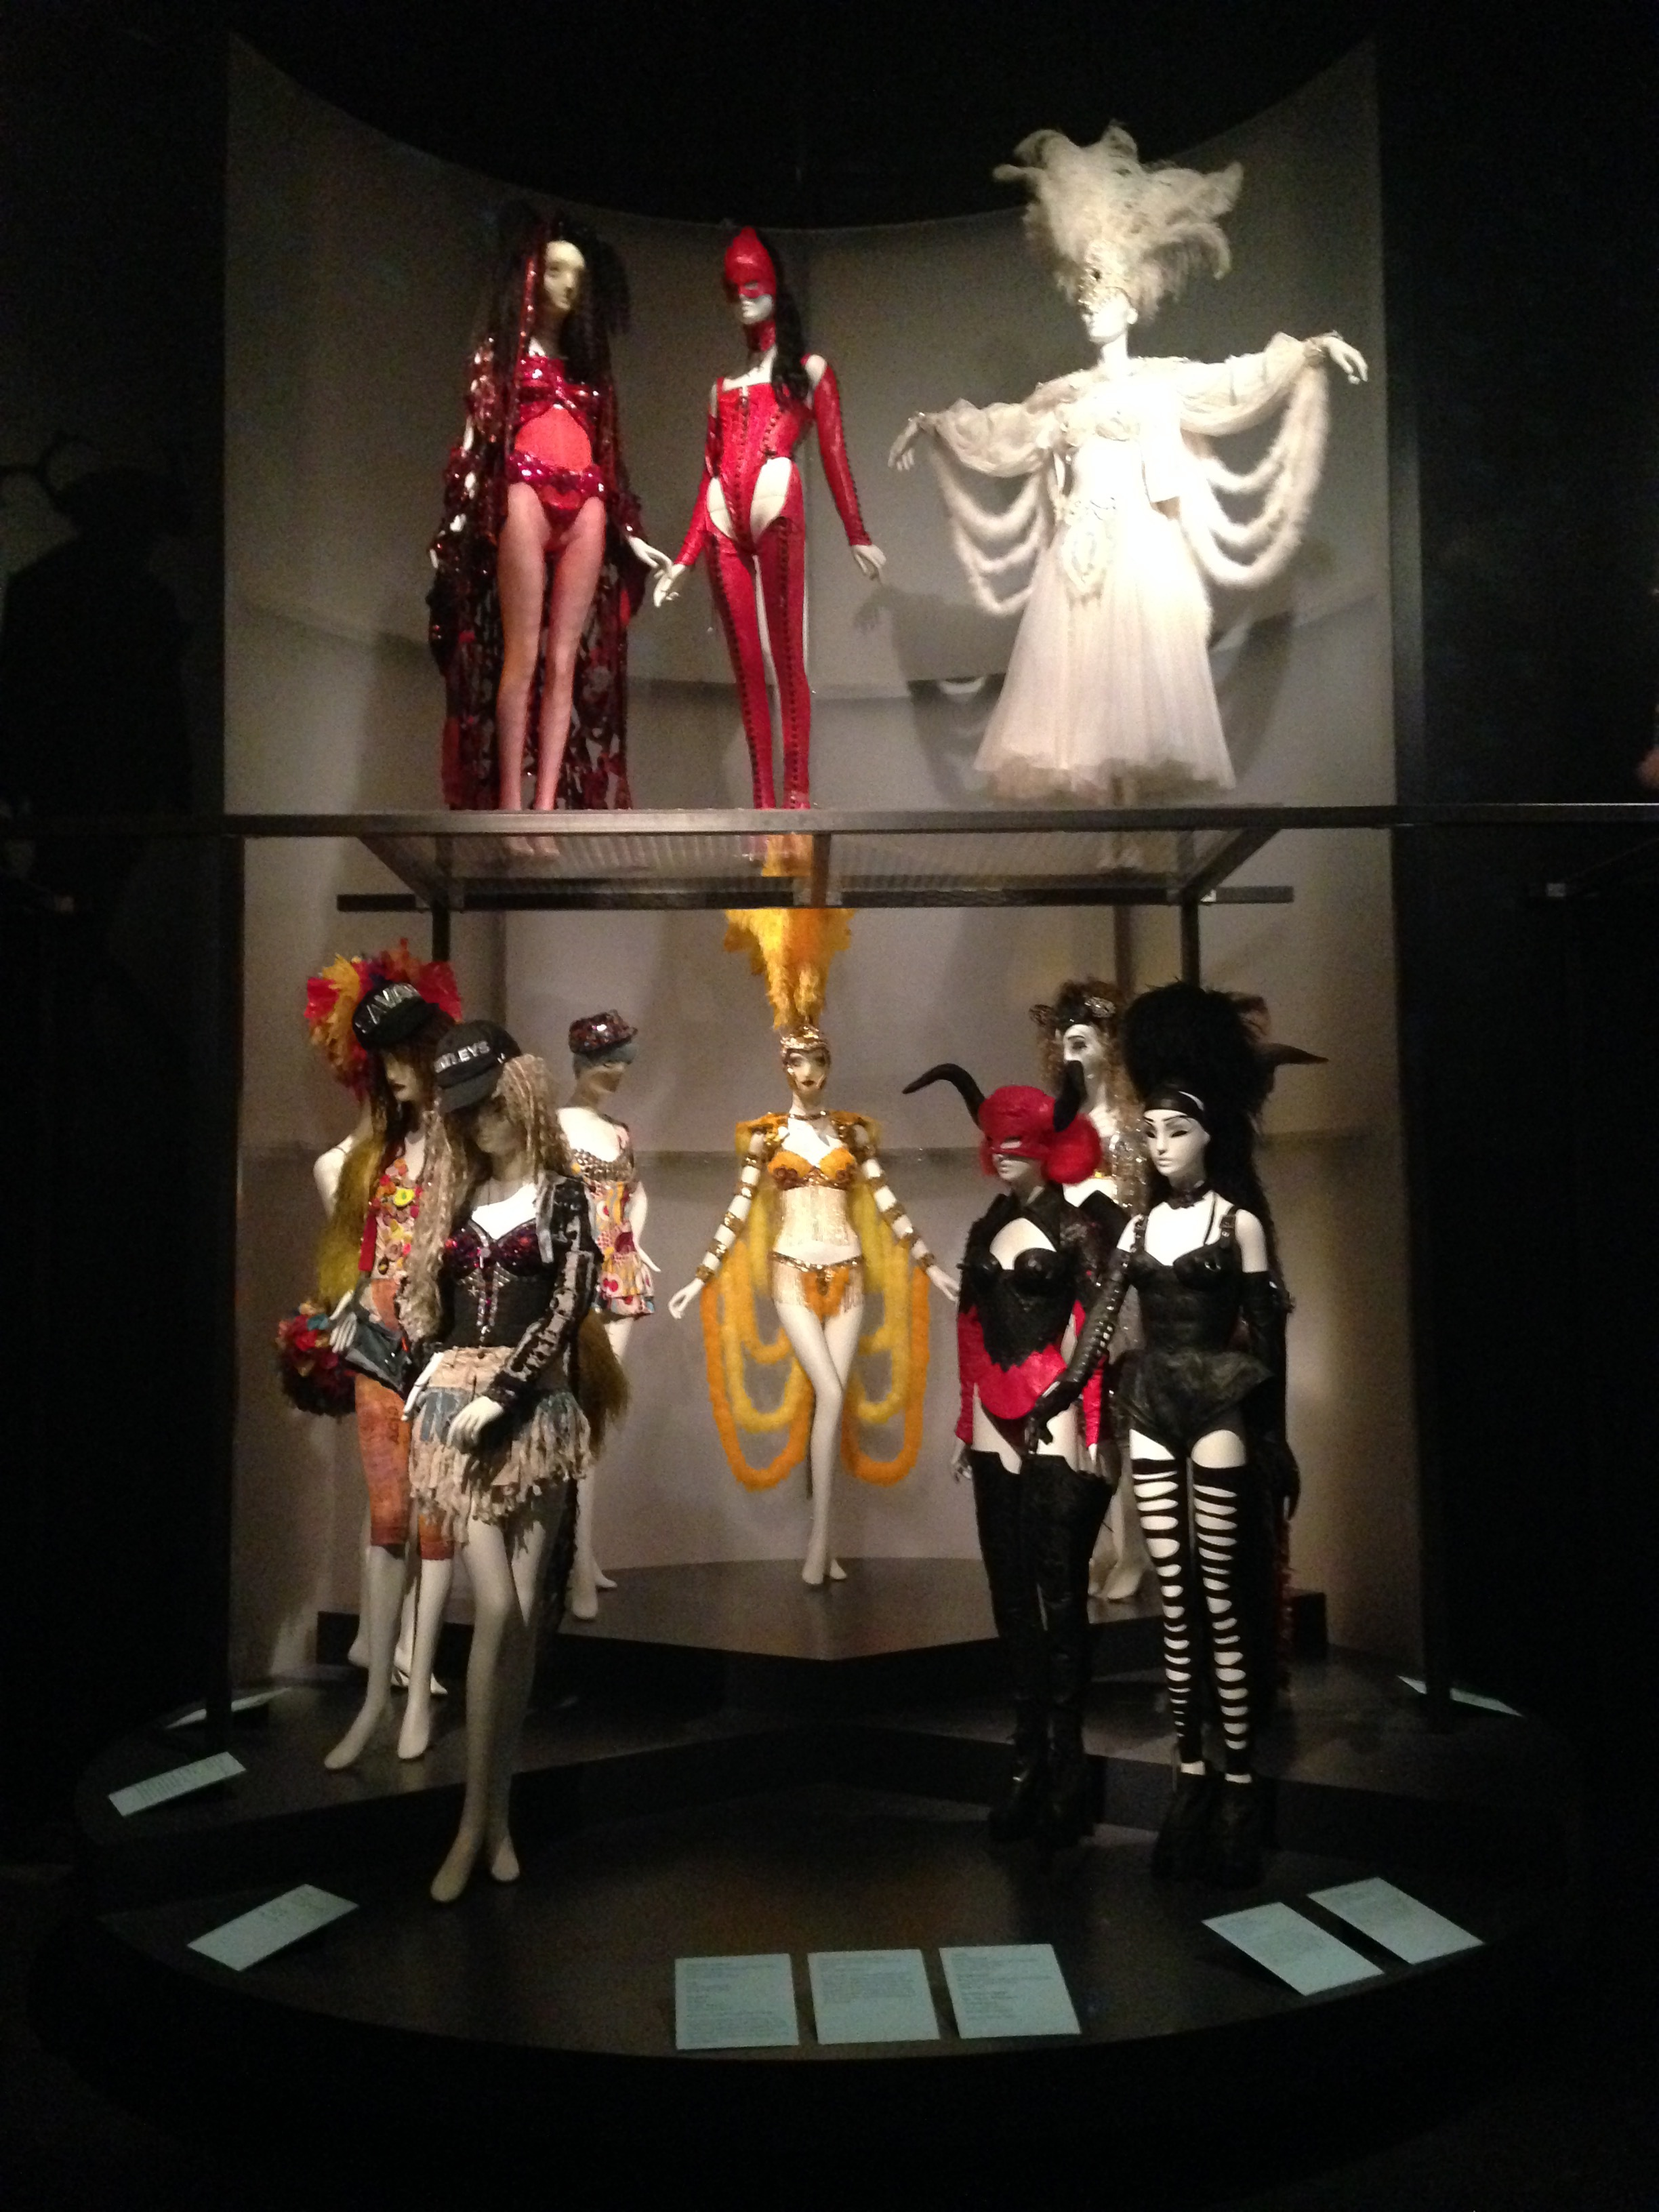 Installation view of 'Fashion Underground: The World of Susanne Bartsch',The Museum at FIT.